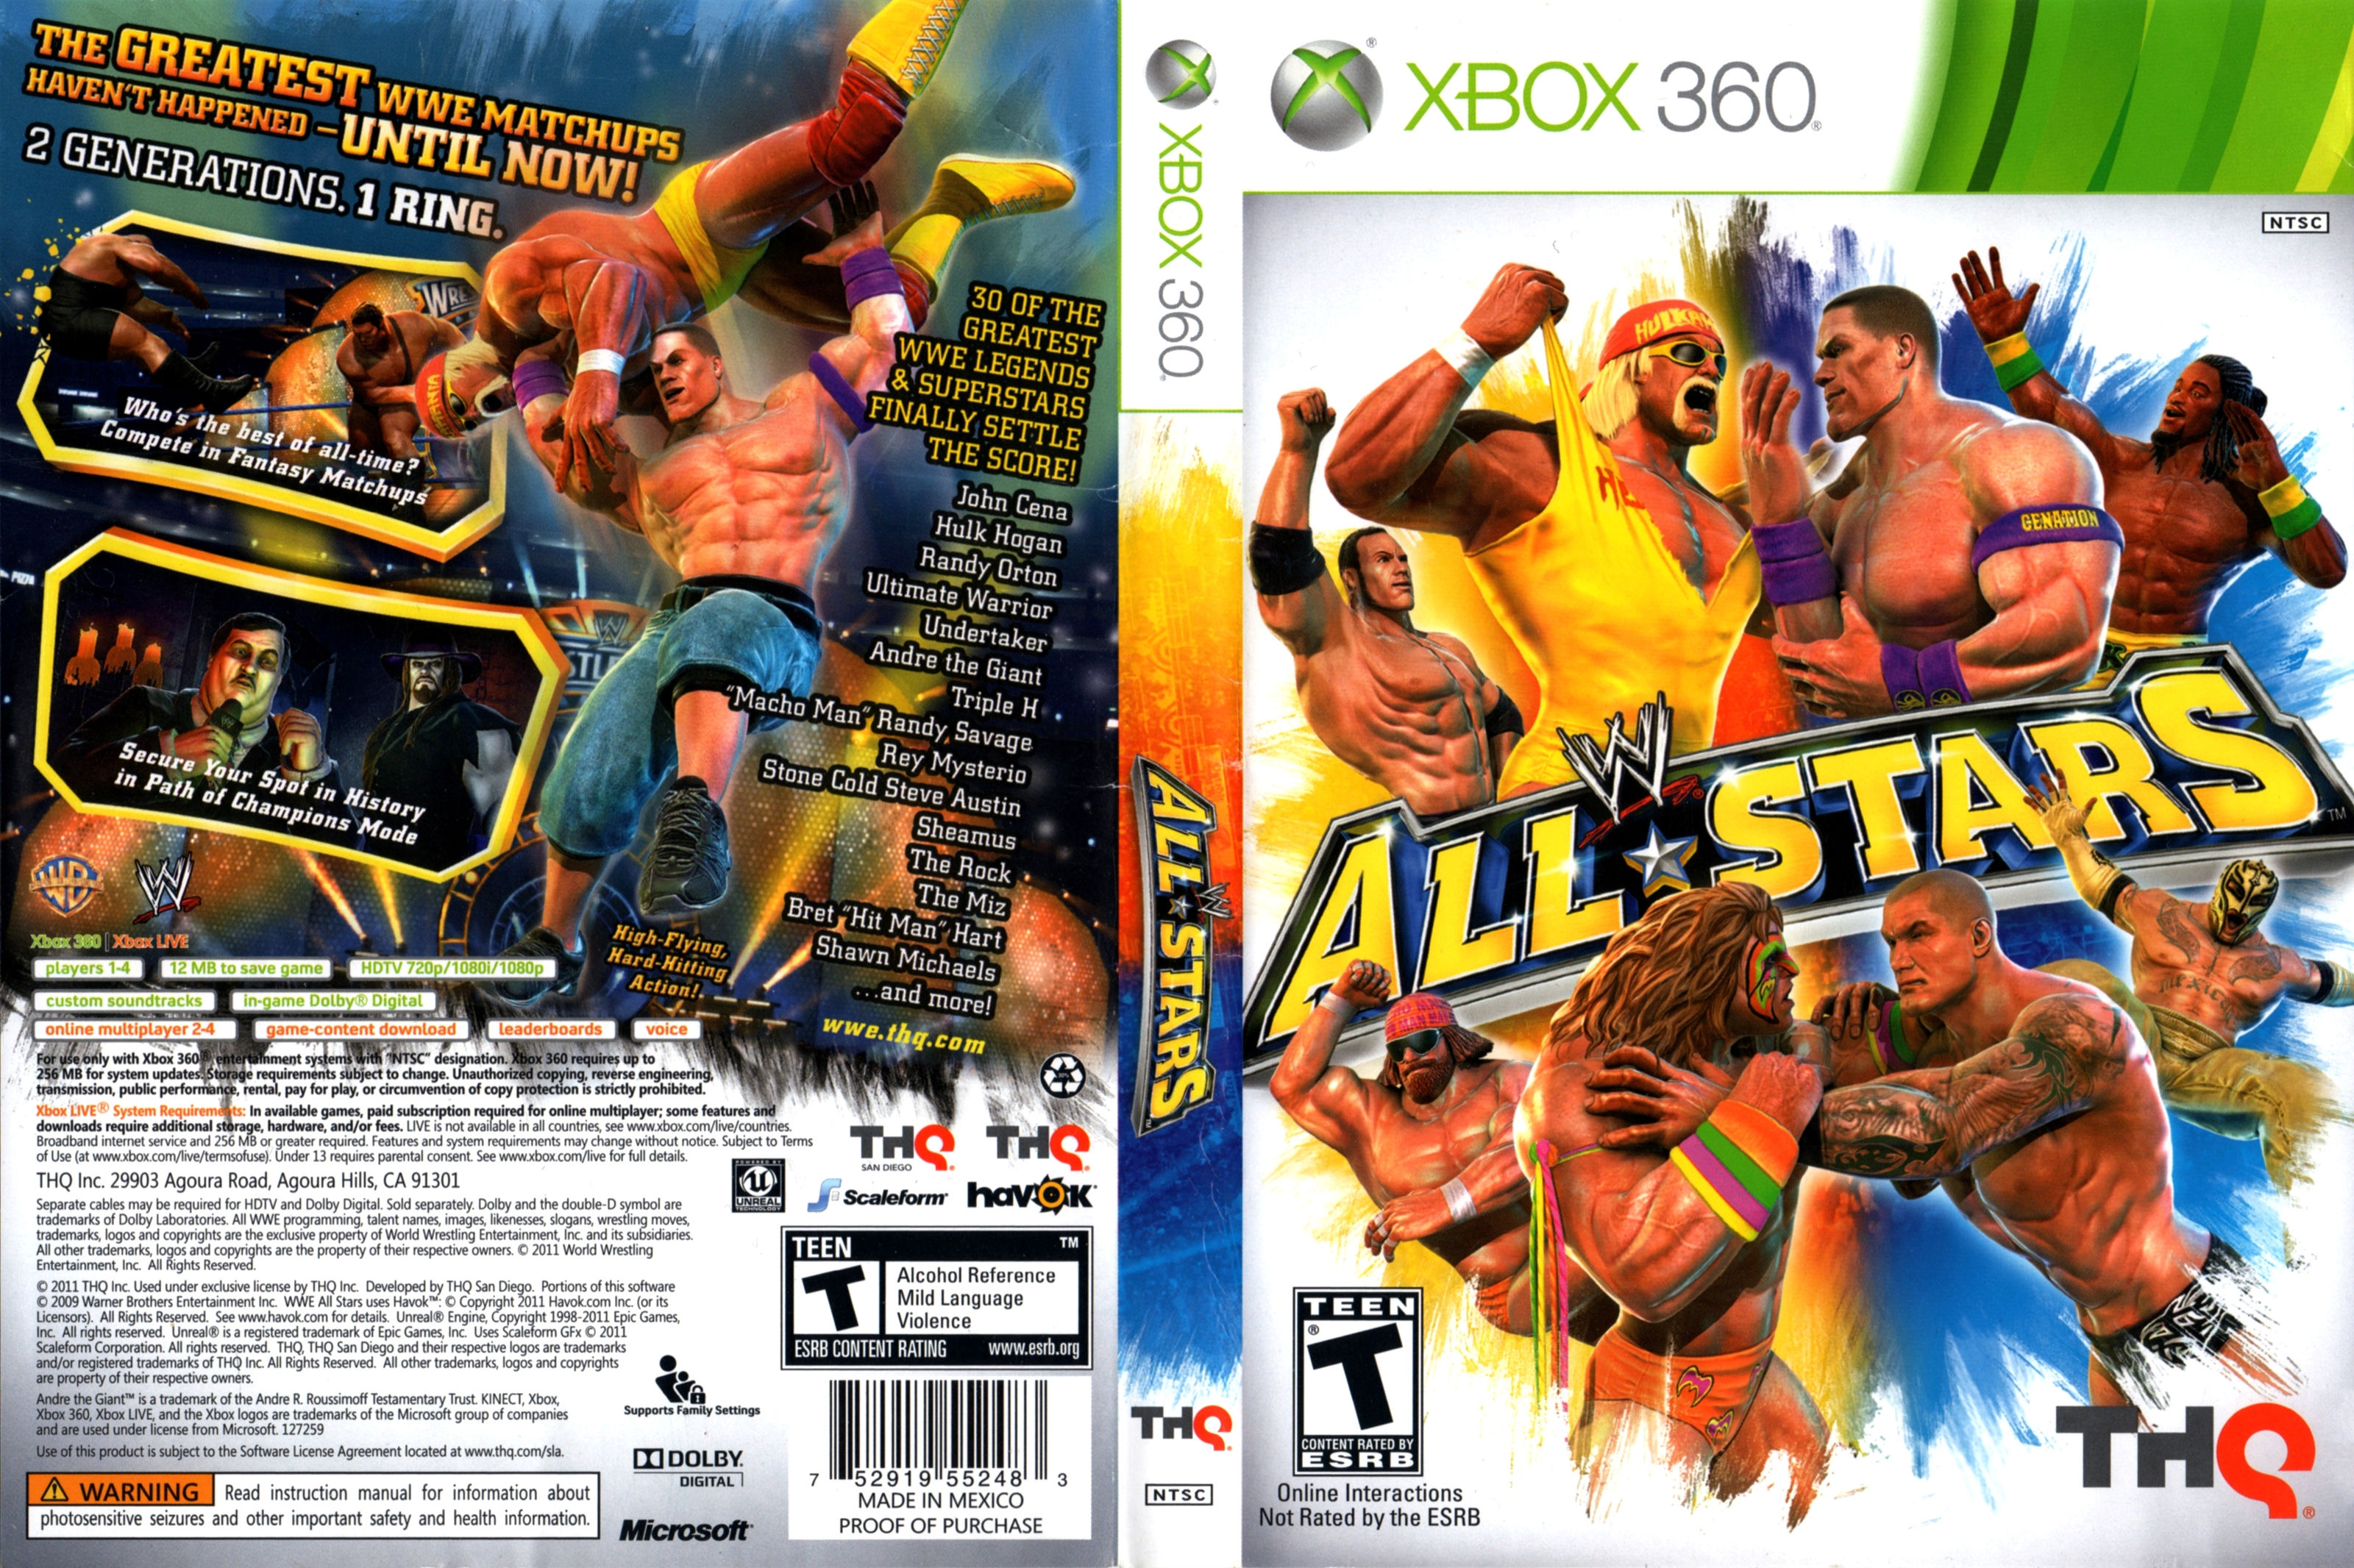 WWEAllStars